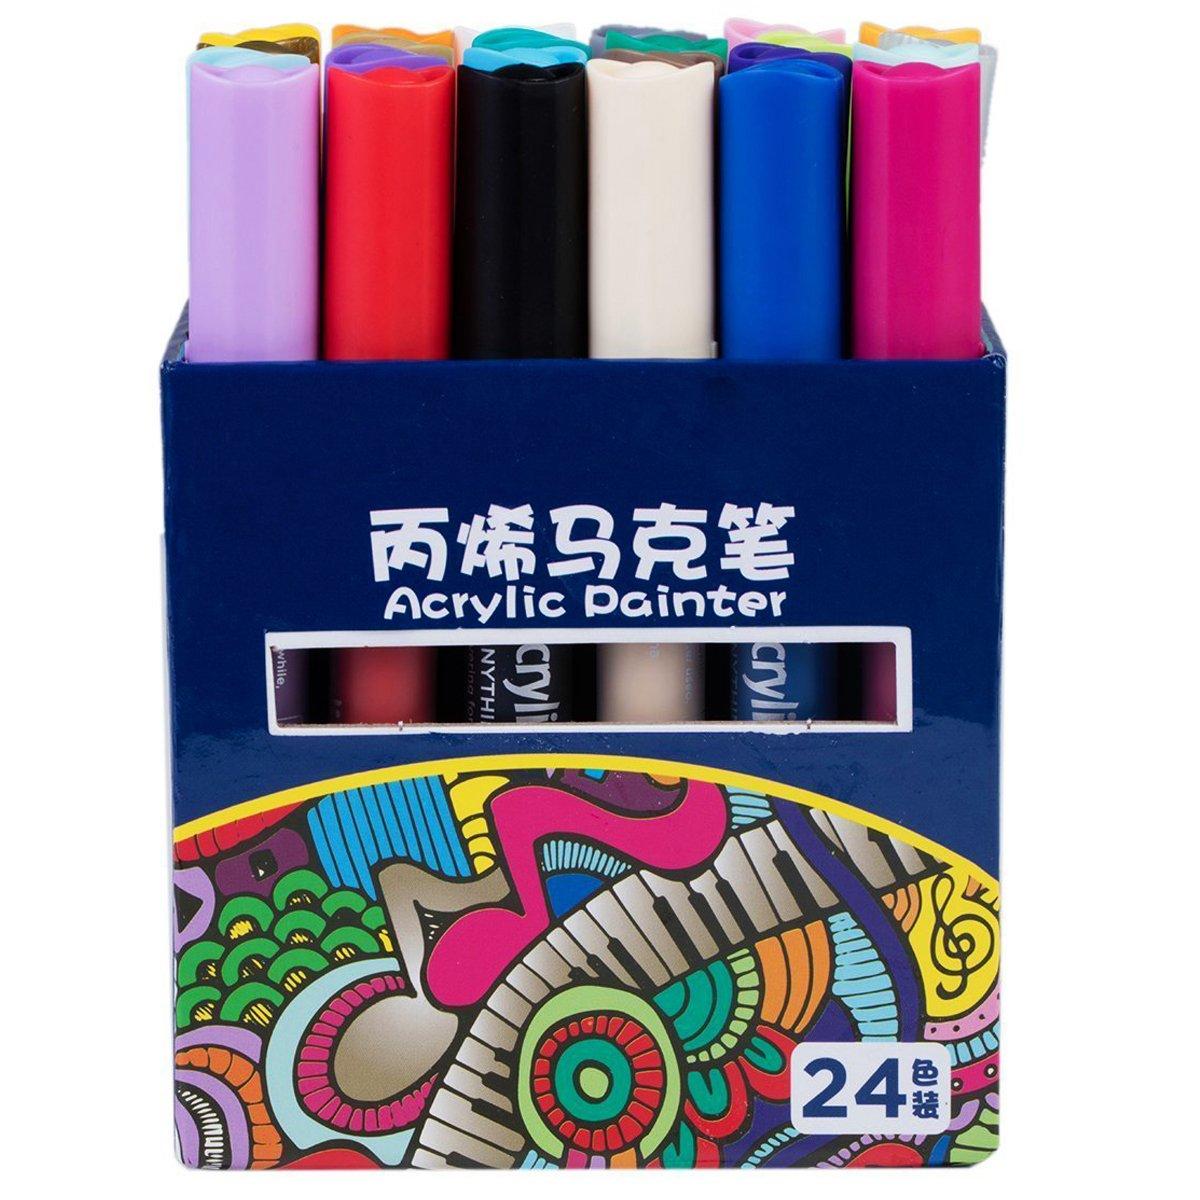 Acrylic Paint Markers 24 Colors Medium Tip Acrylic Pens ...